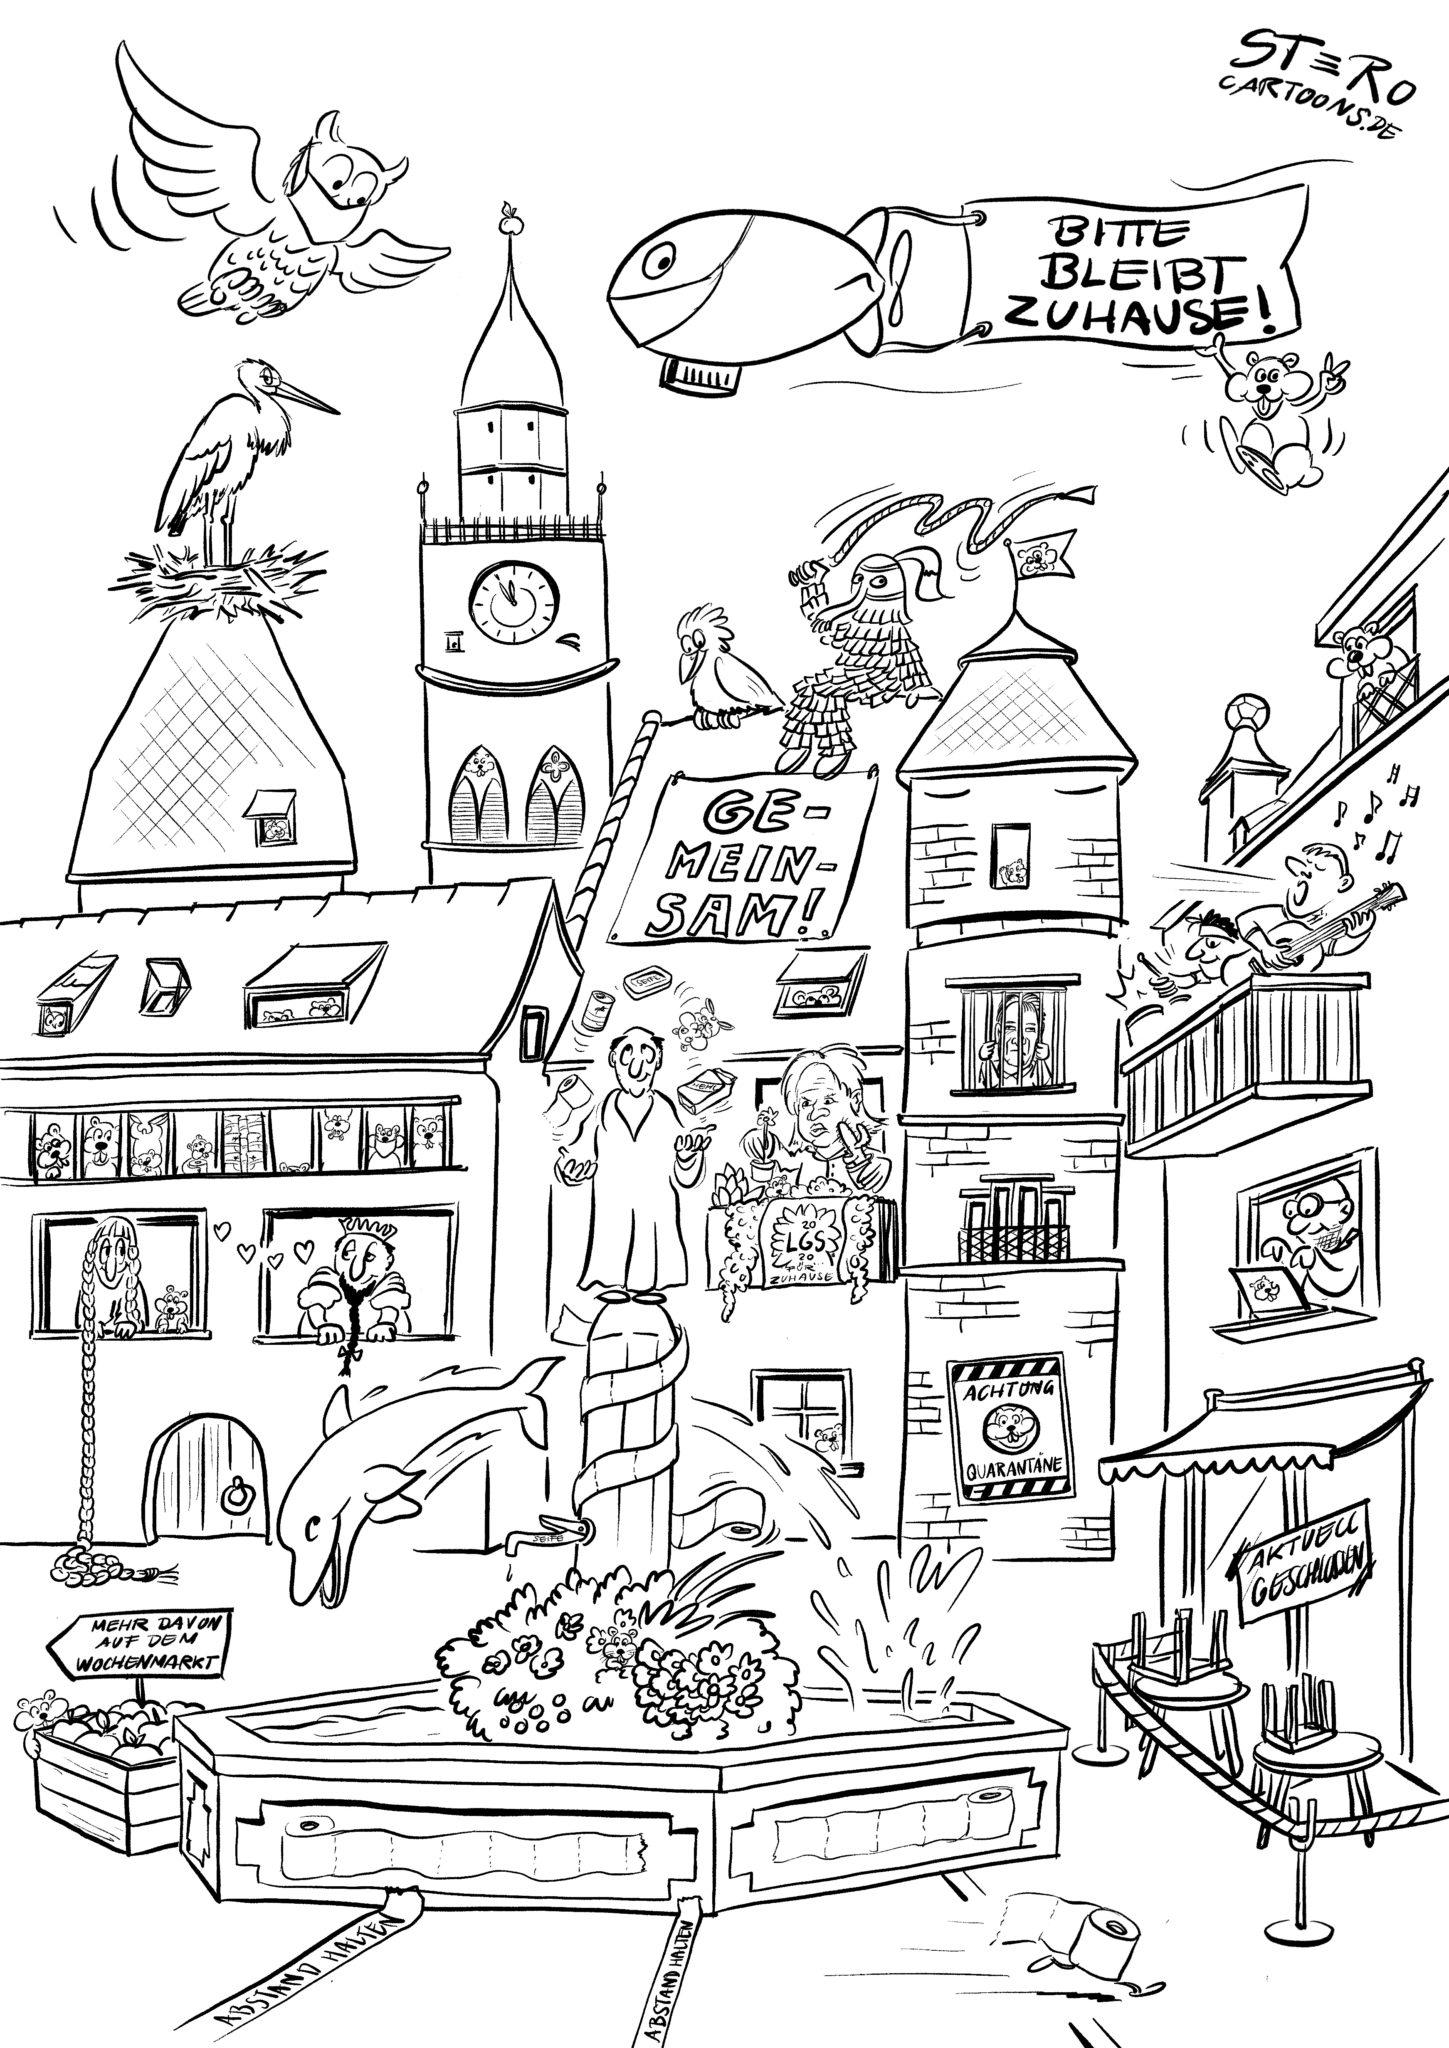 cartoonkarikaturmalvorlage wimmelbild  rothcartoons de